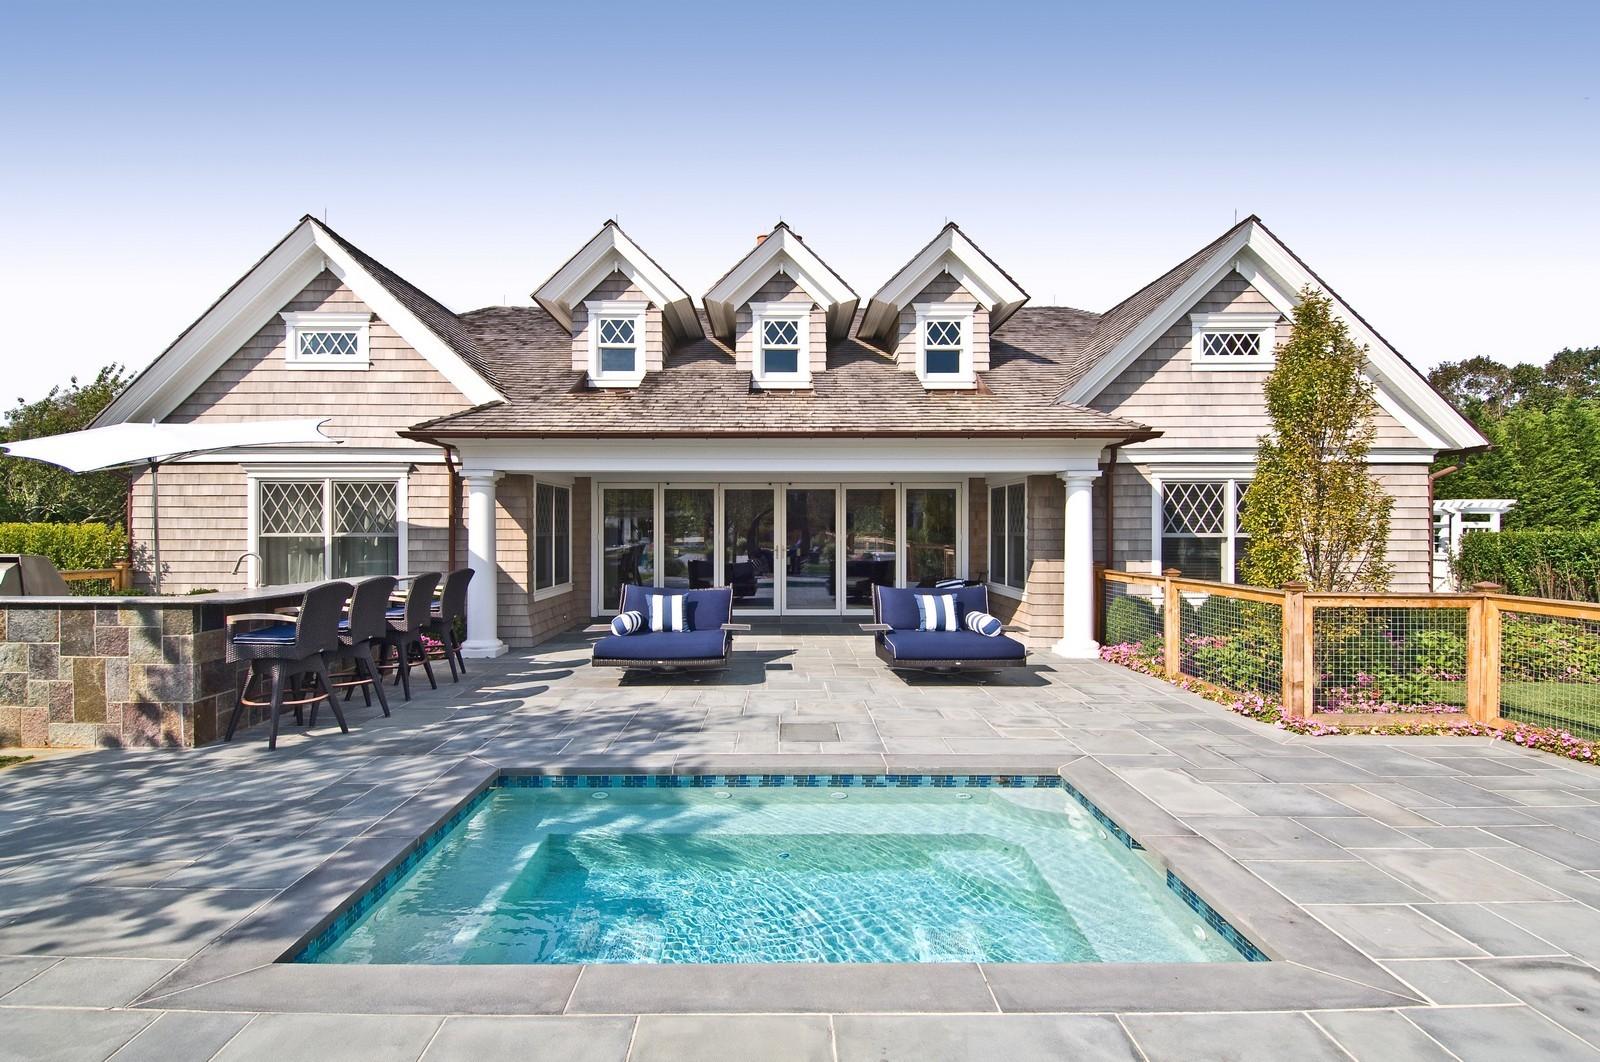 Real Estate Photography - 612 halsey lane, bridgehampton, NY, 11932 - Location 1